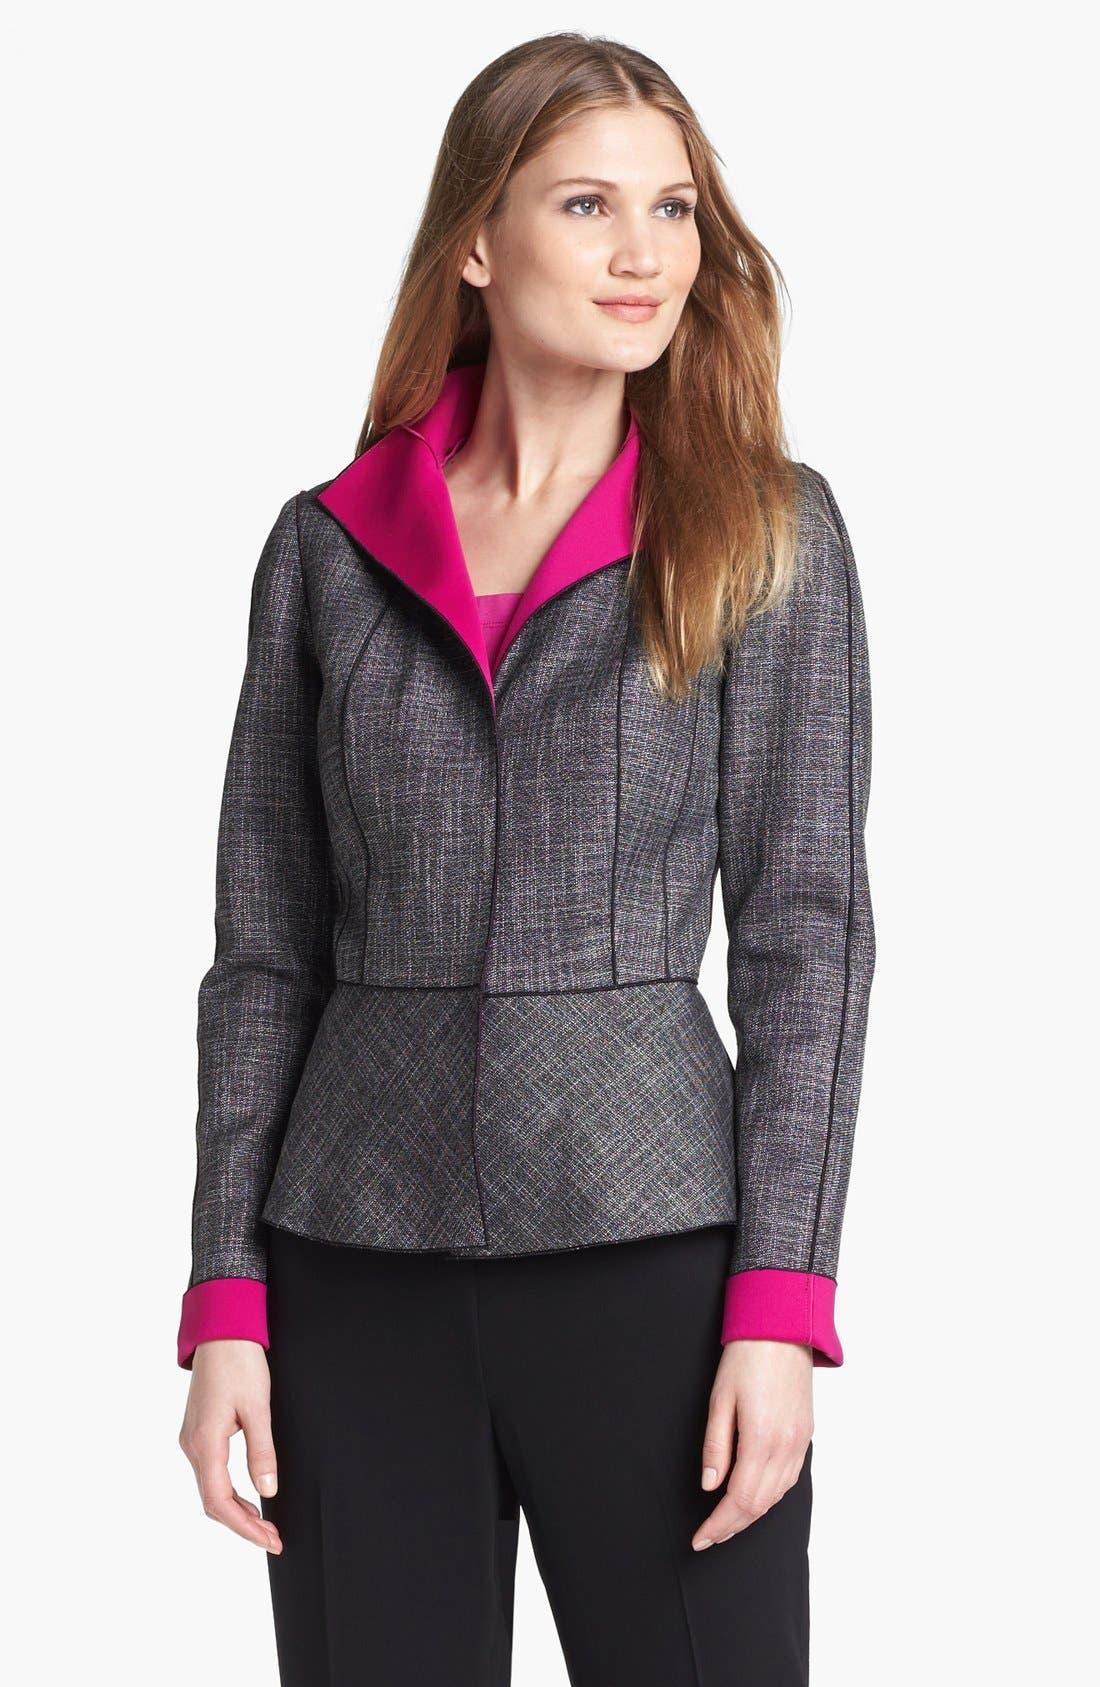 Alternate Image 1 Selected - Lafayette 148 New York 'Amanda - Convex Cloth' Jacket